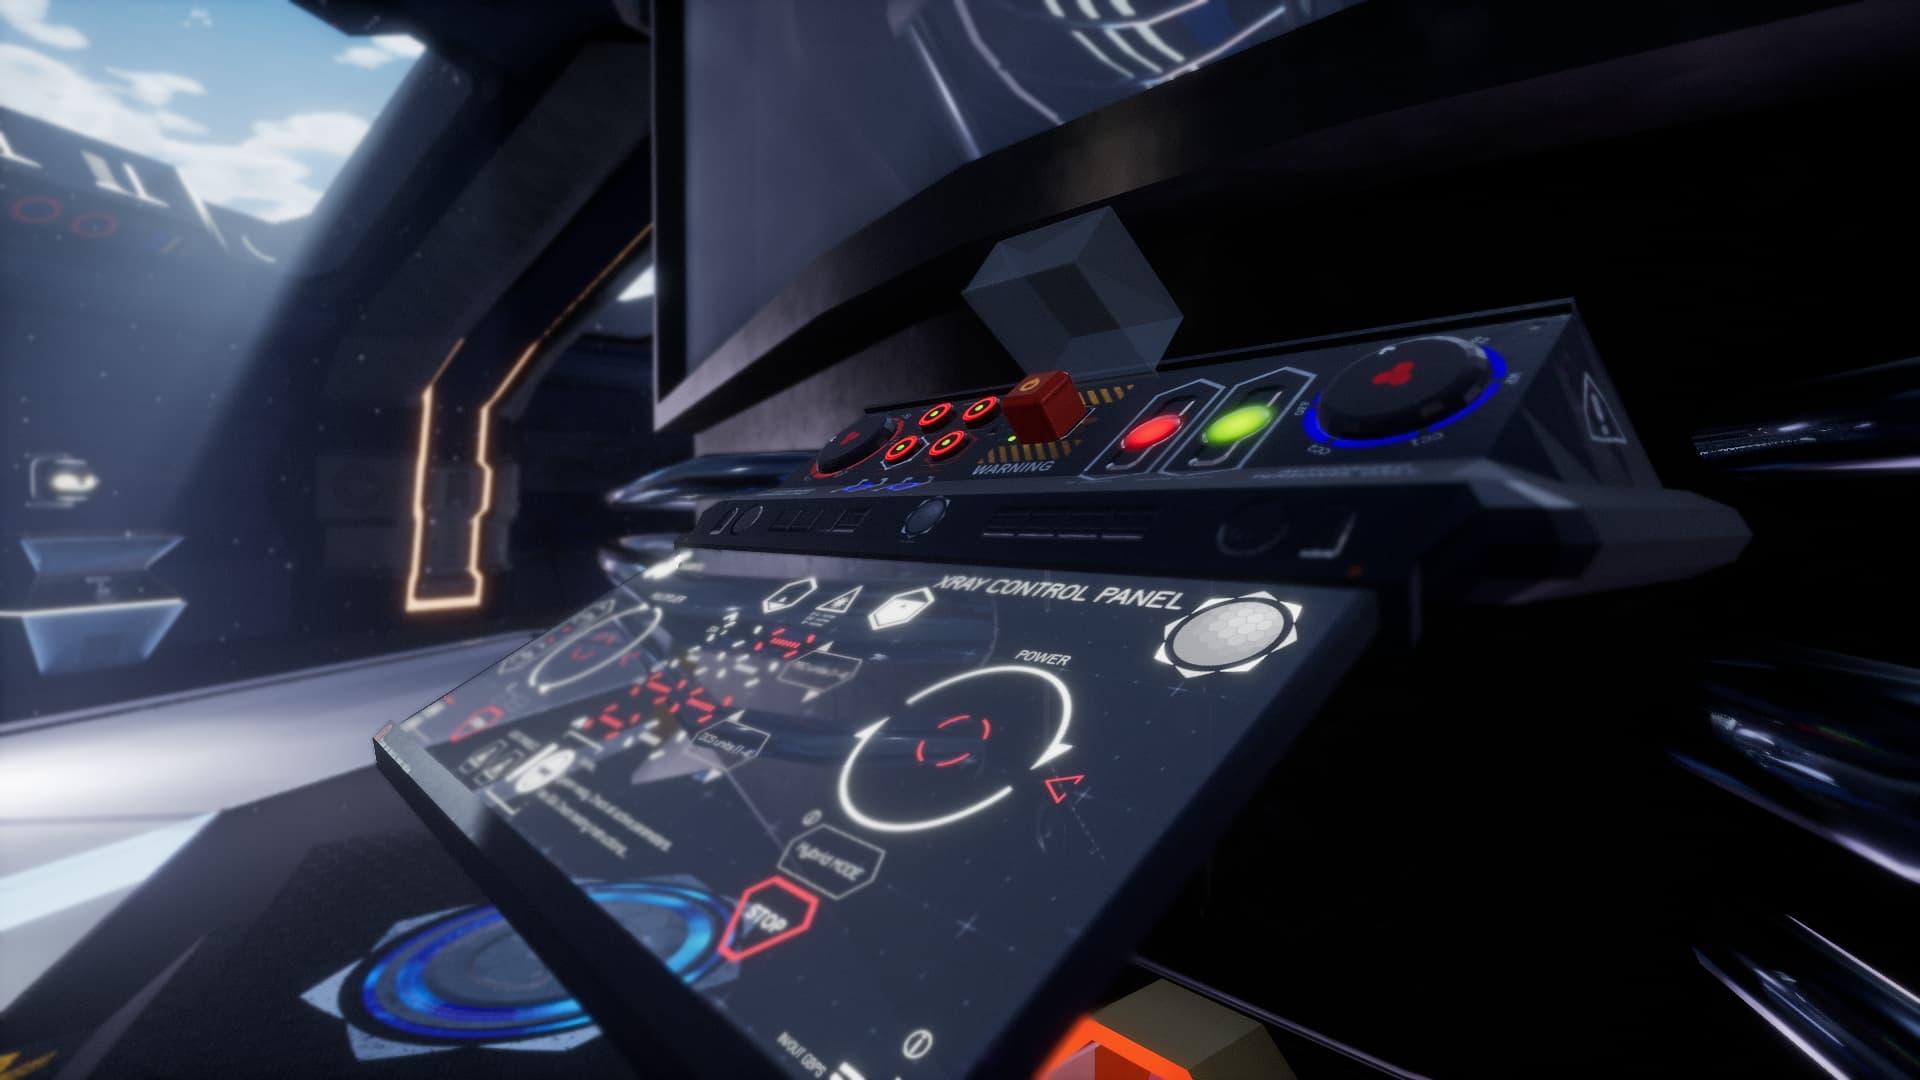 VR Expo World представлен на международной выставке «Территория NDT 2020»